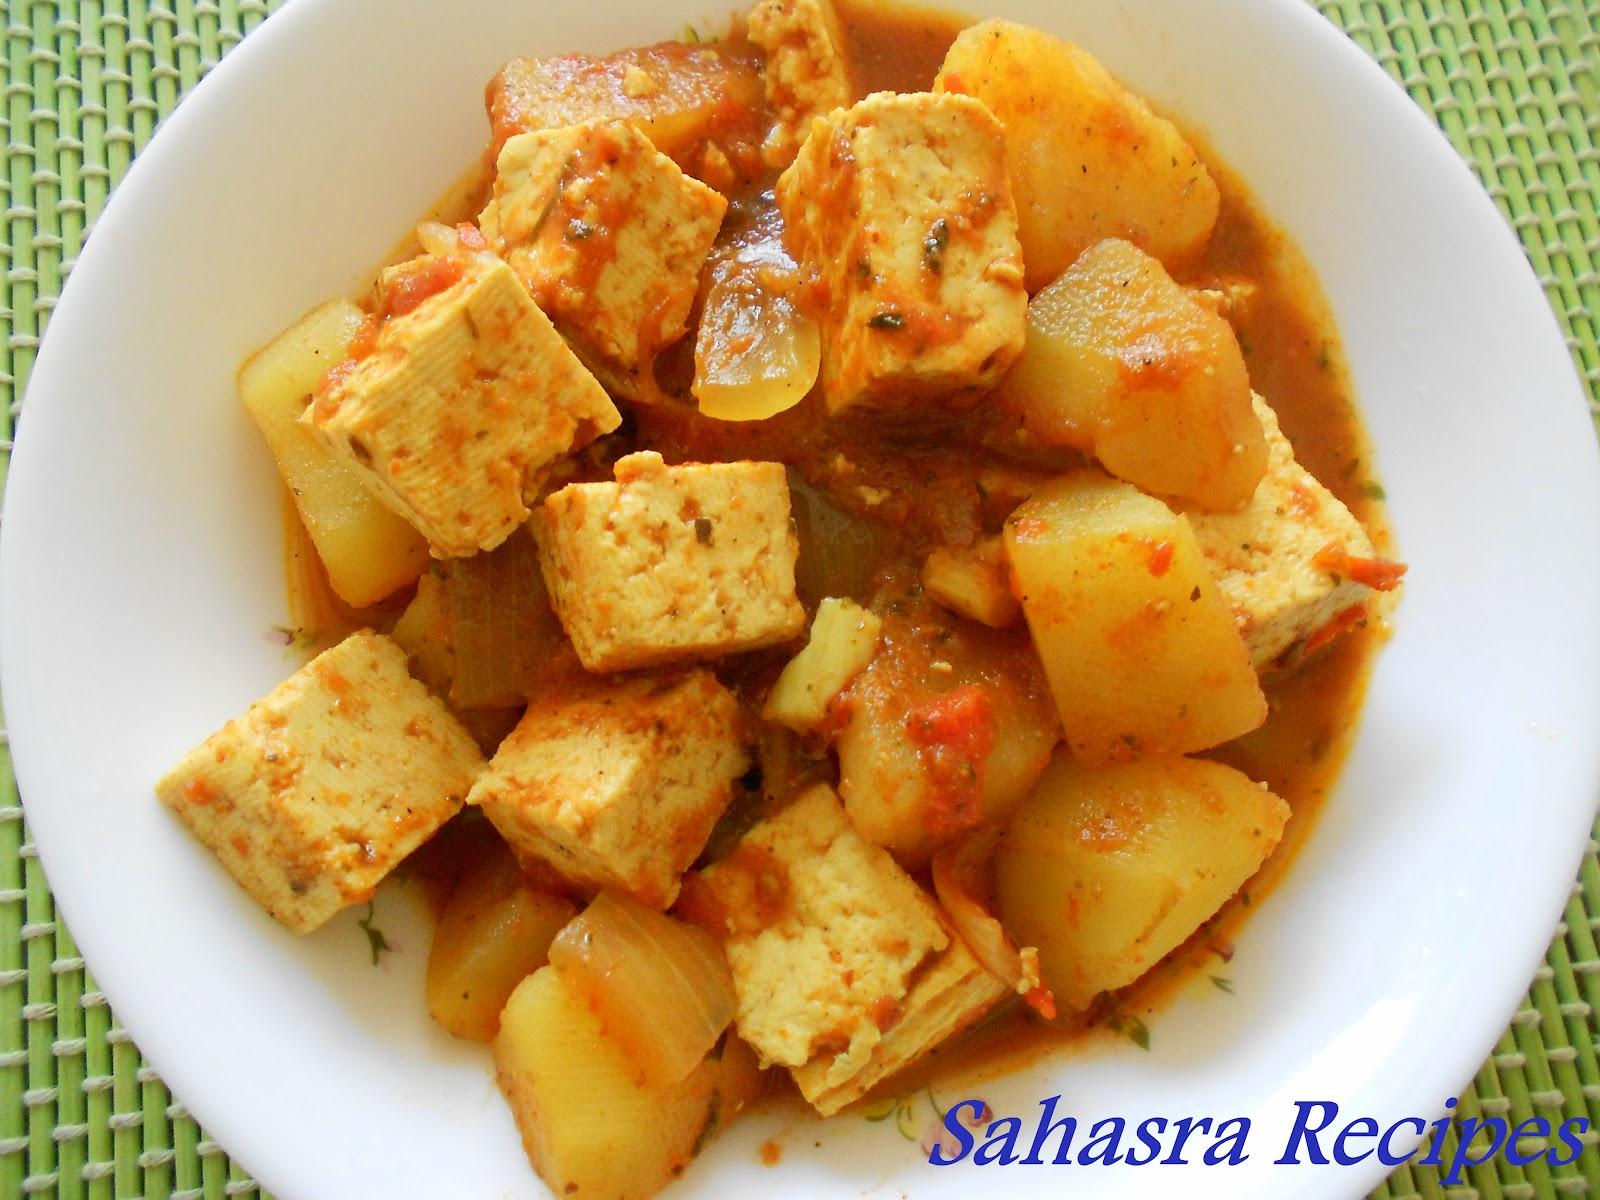 Sahasra Recipes: Potato Tofu Curry